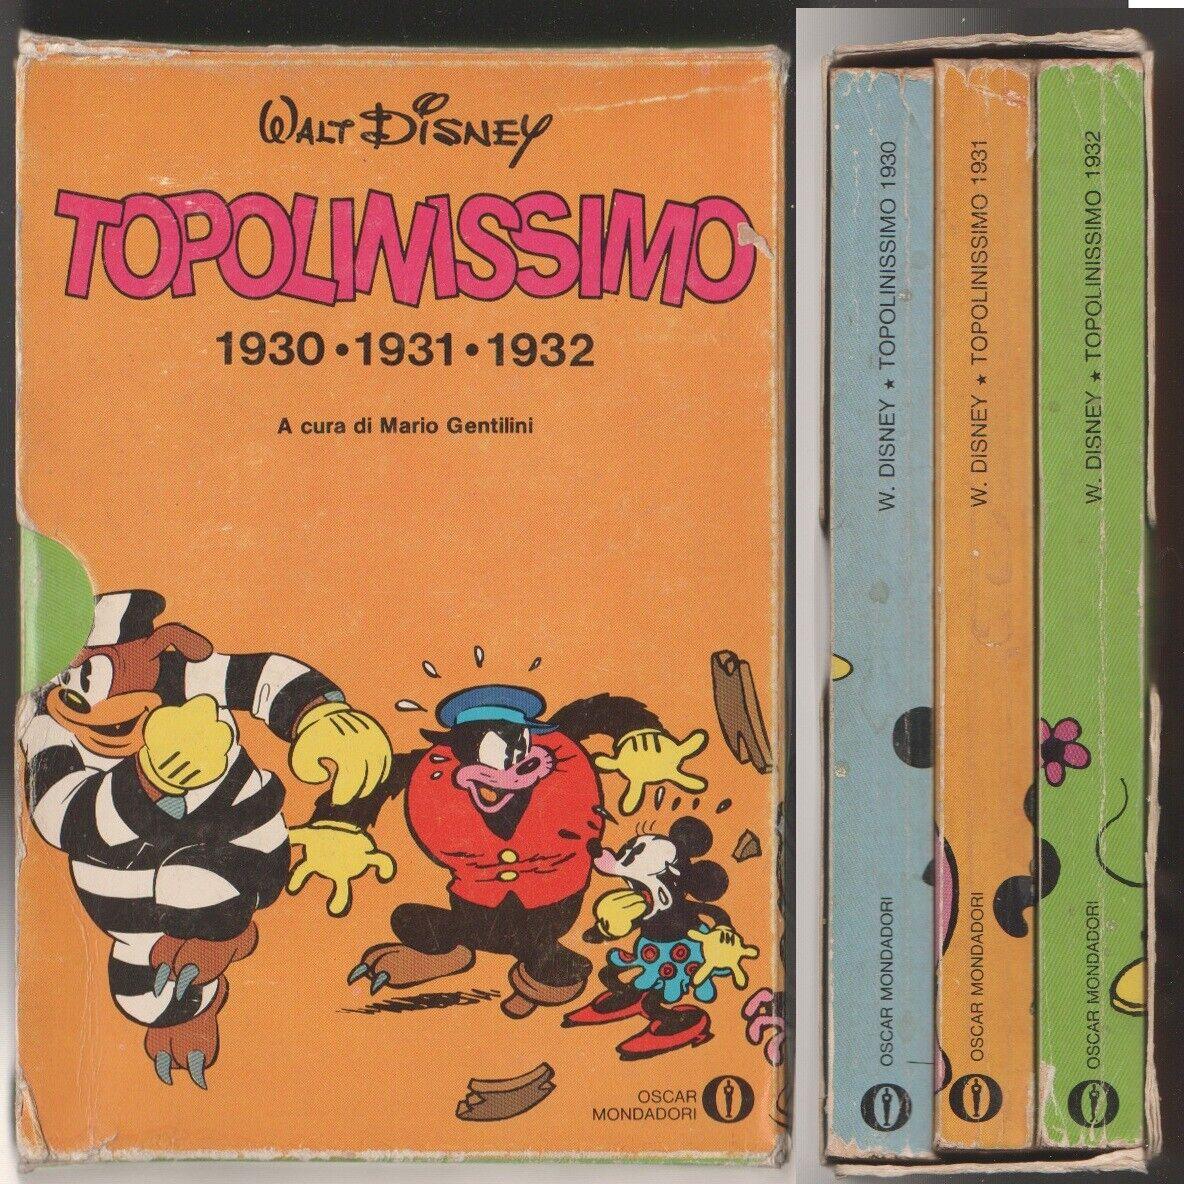 Topolinissimo 1930 - 1931 - 1932